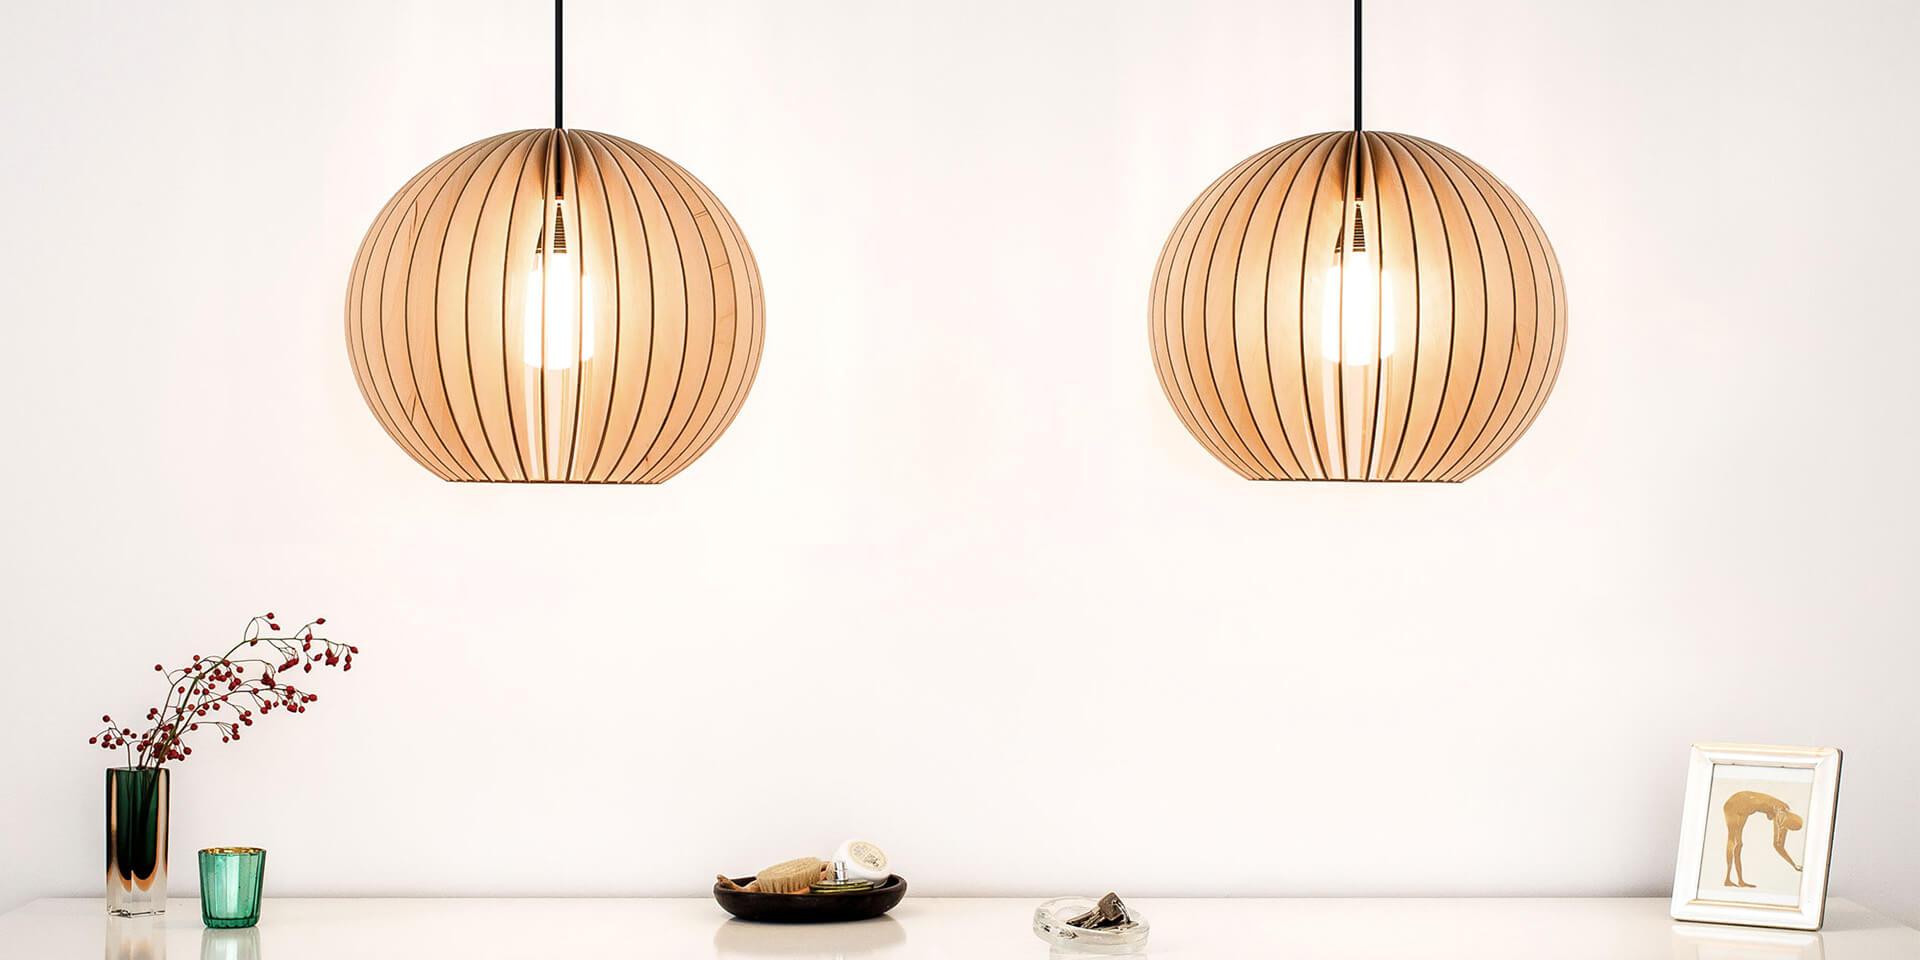 moderne h ngeleuchten von trendigen labels online kaufen satamo. Black Bedroom Furniture Sets. Home Design Ideas